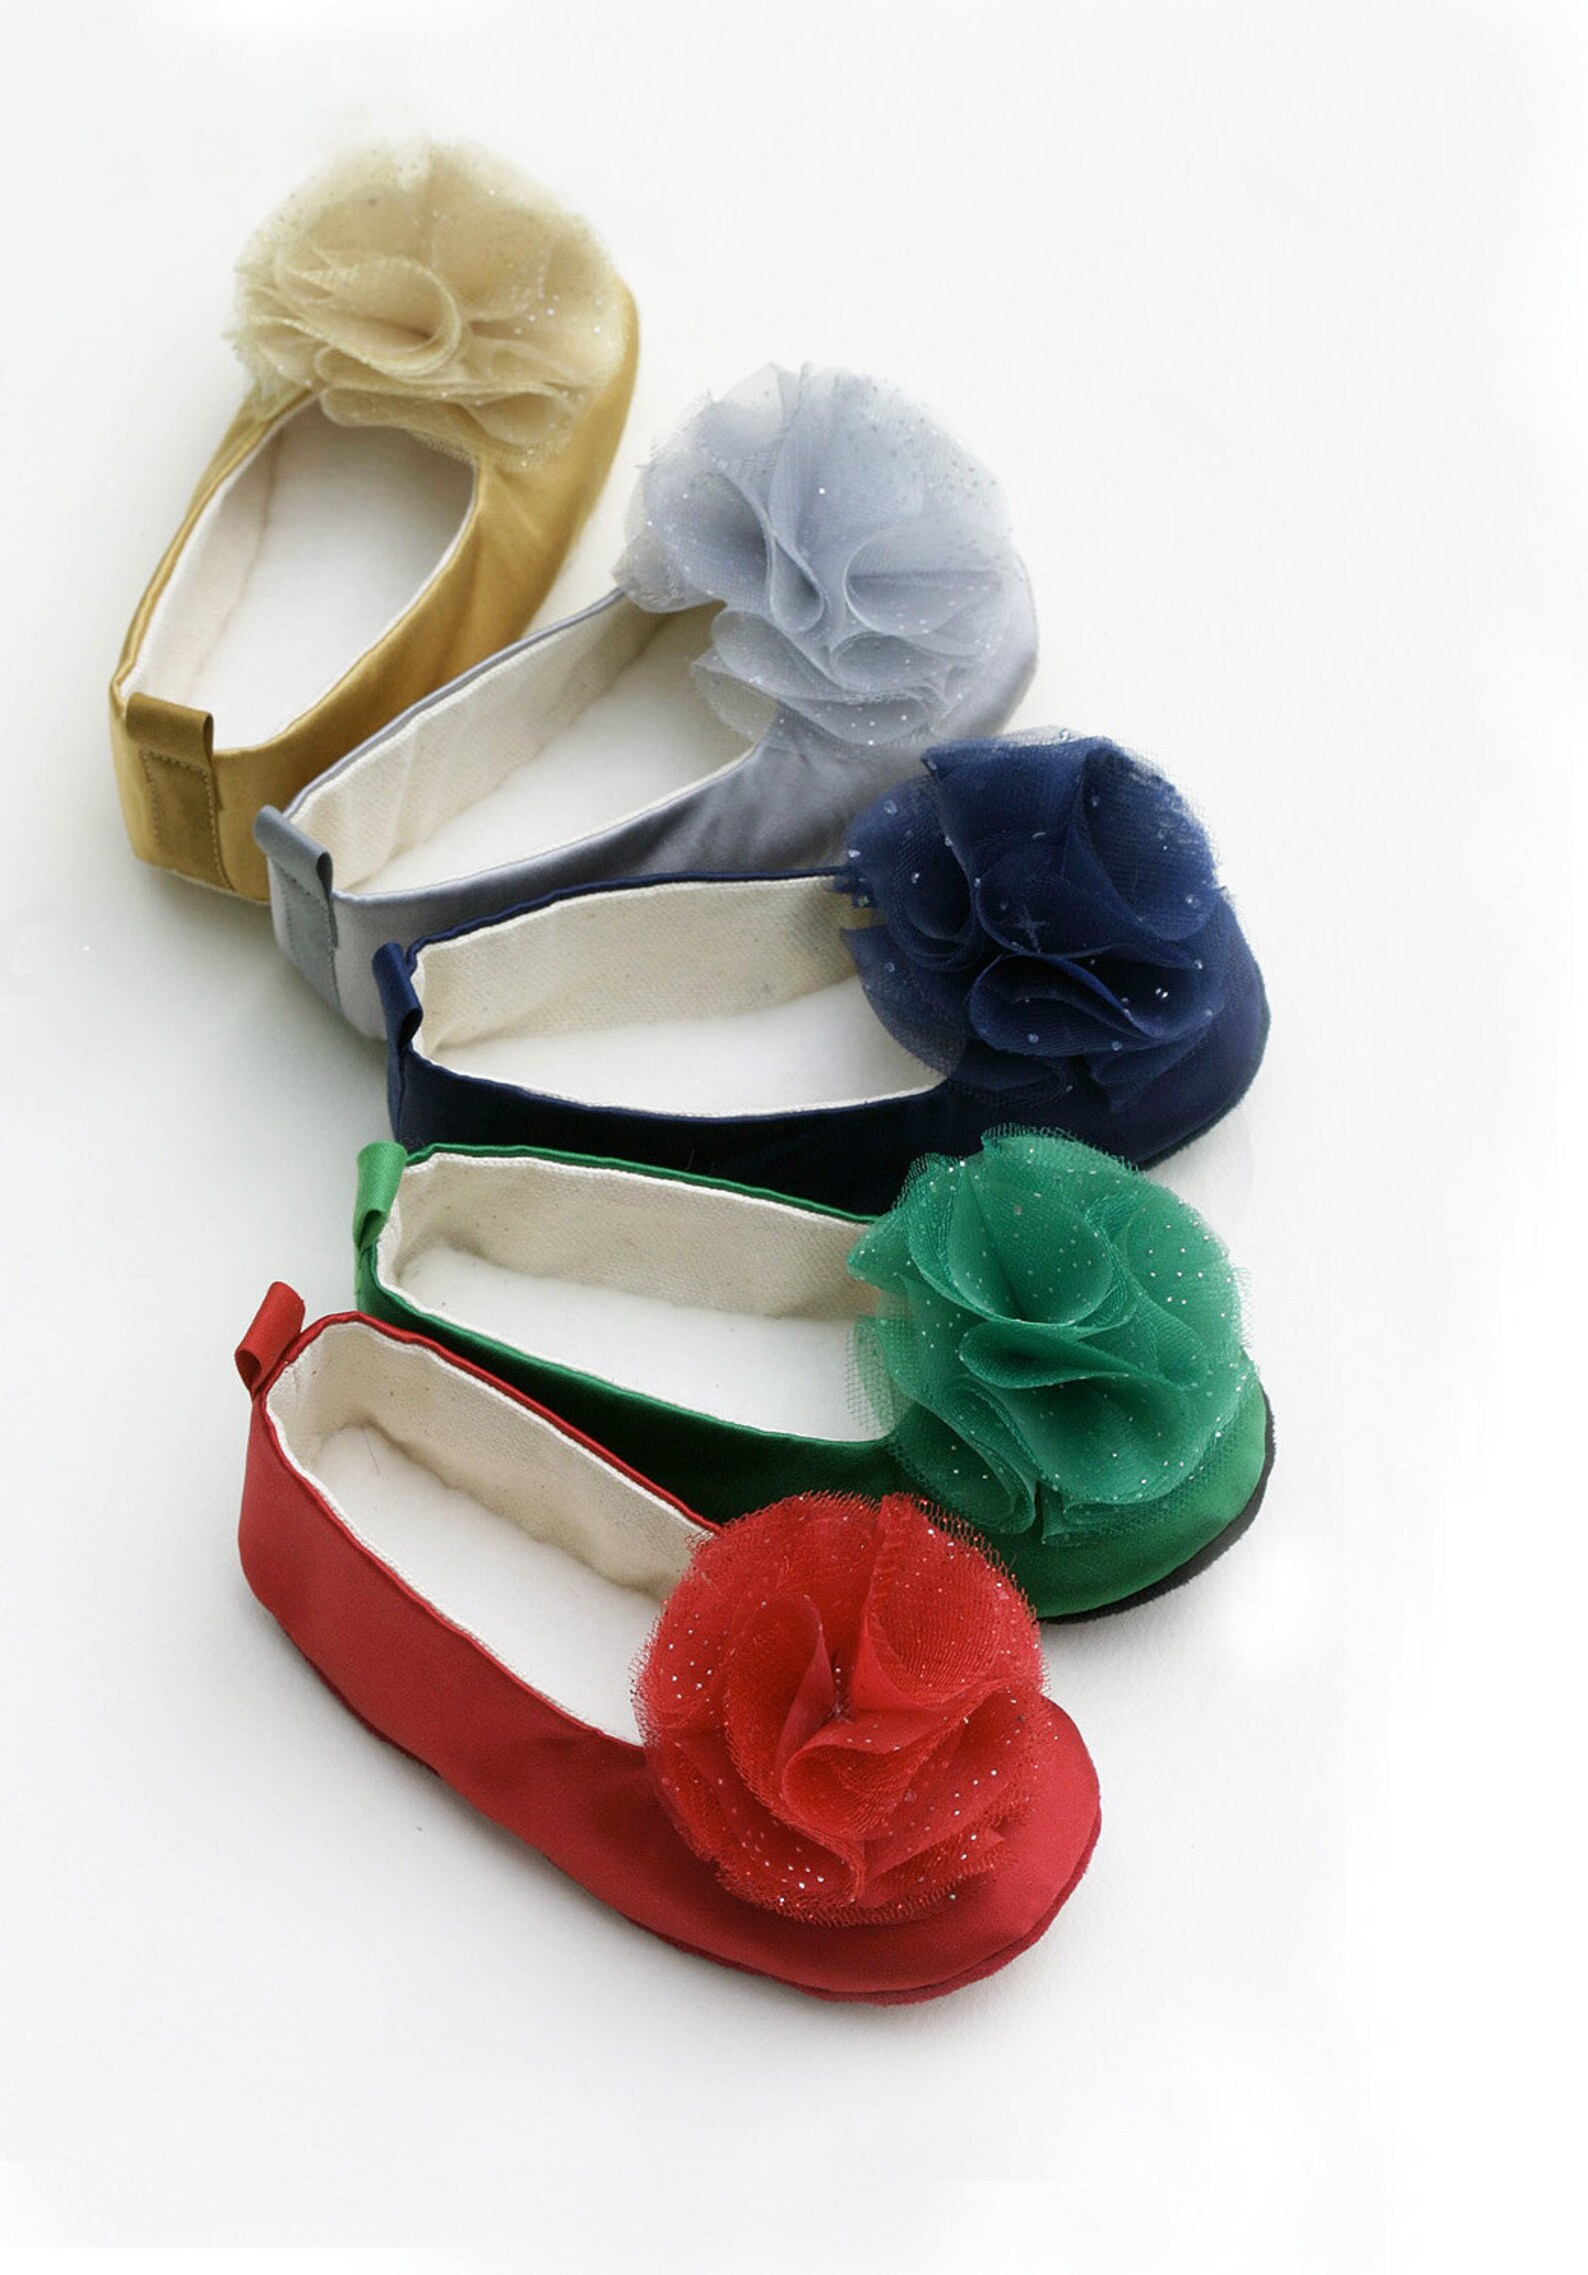 satin pastel flower girl shoe, baby, toddler ballet slipper, ballet flat, girls wedding shoe, special occasion, holiday dress up